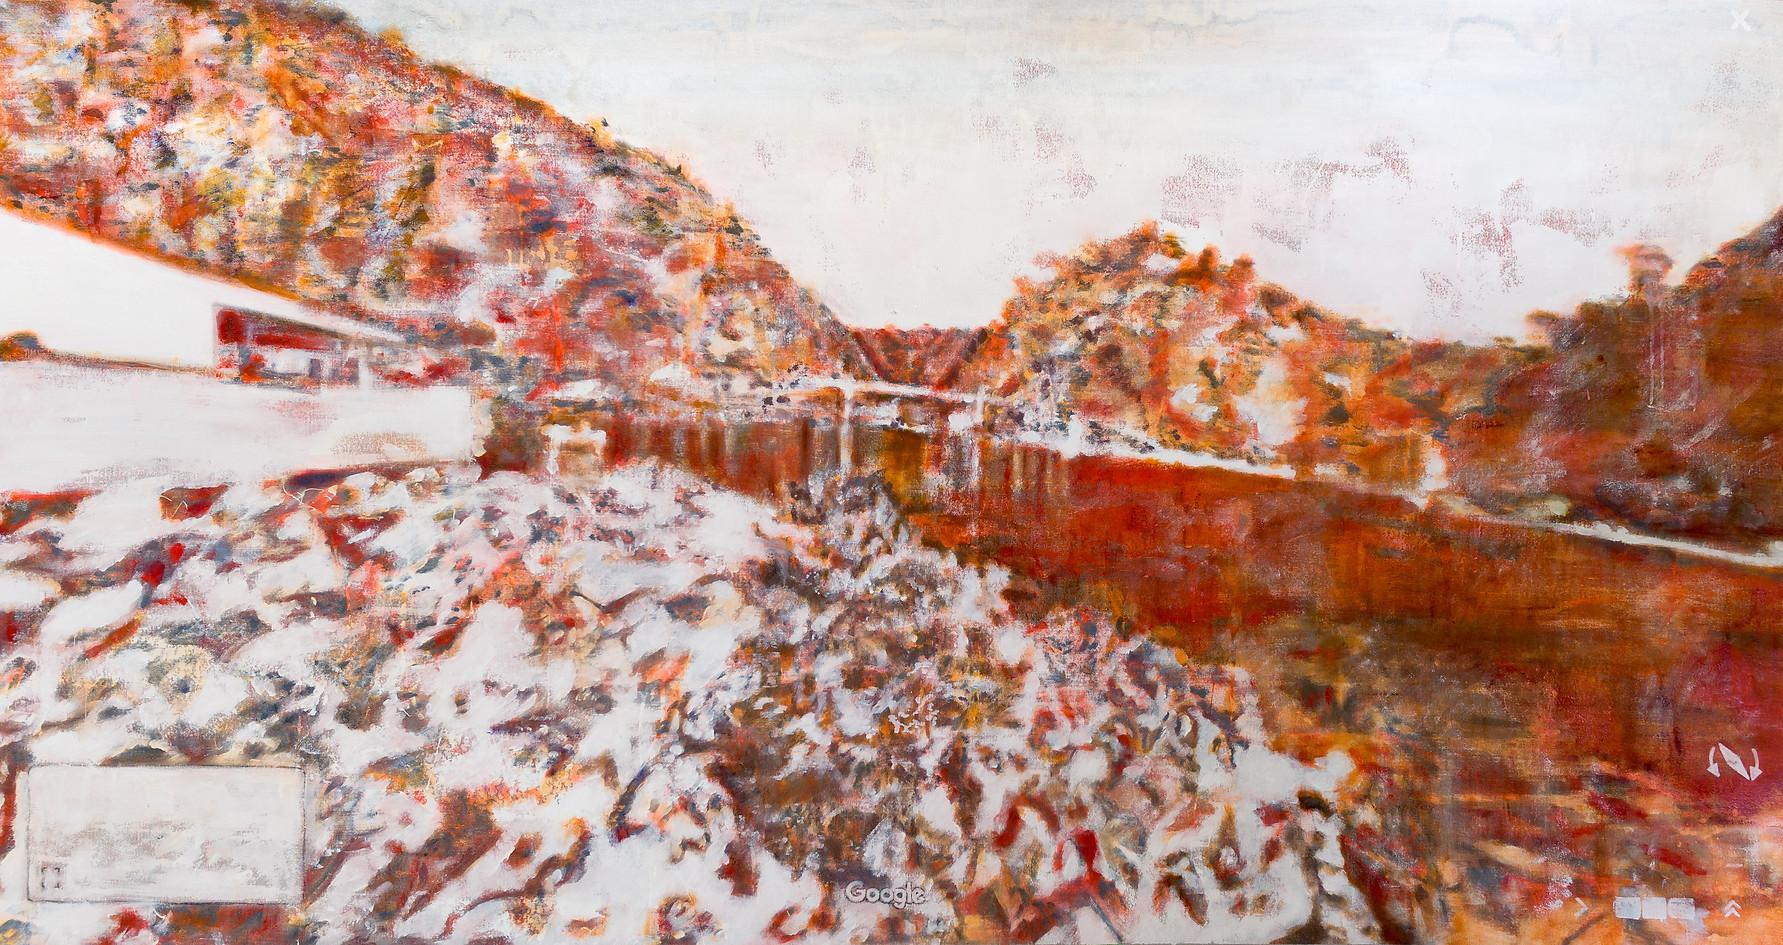 Google It, 80 x 190 cm, Oil & Acrylic on Canvas, 2020